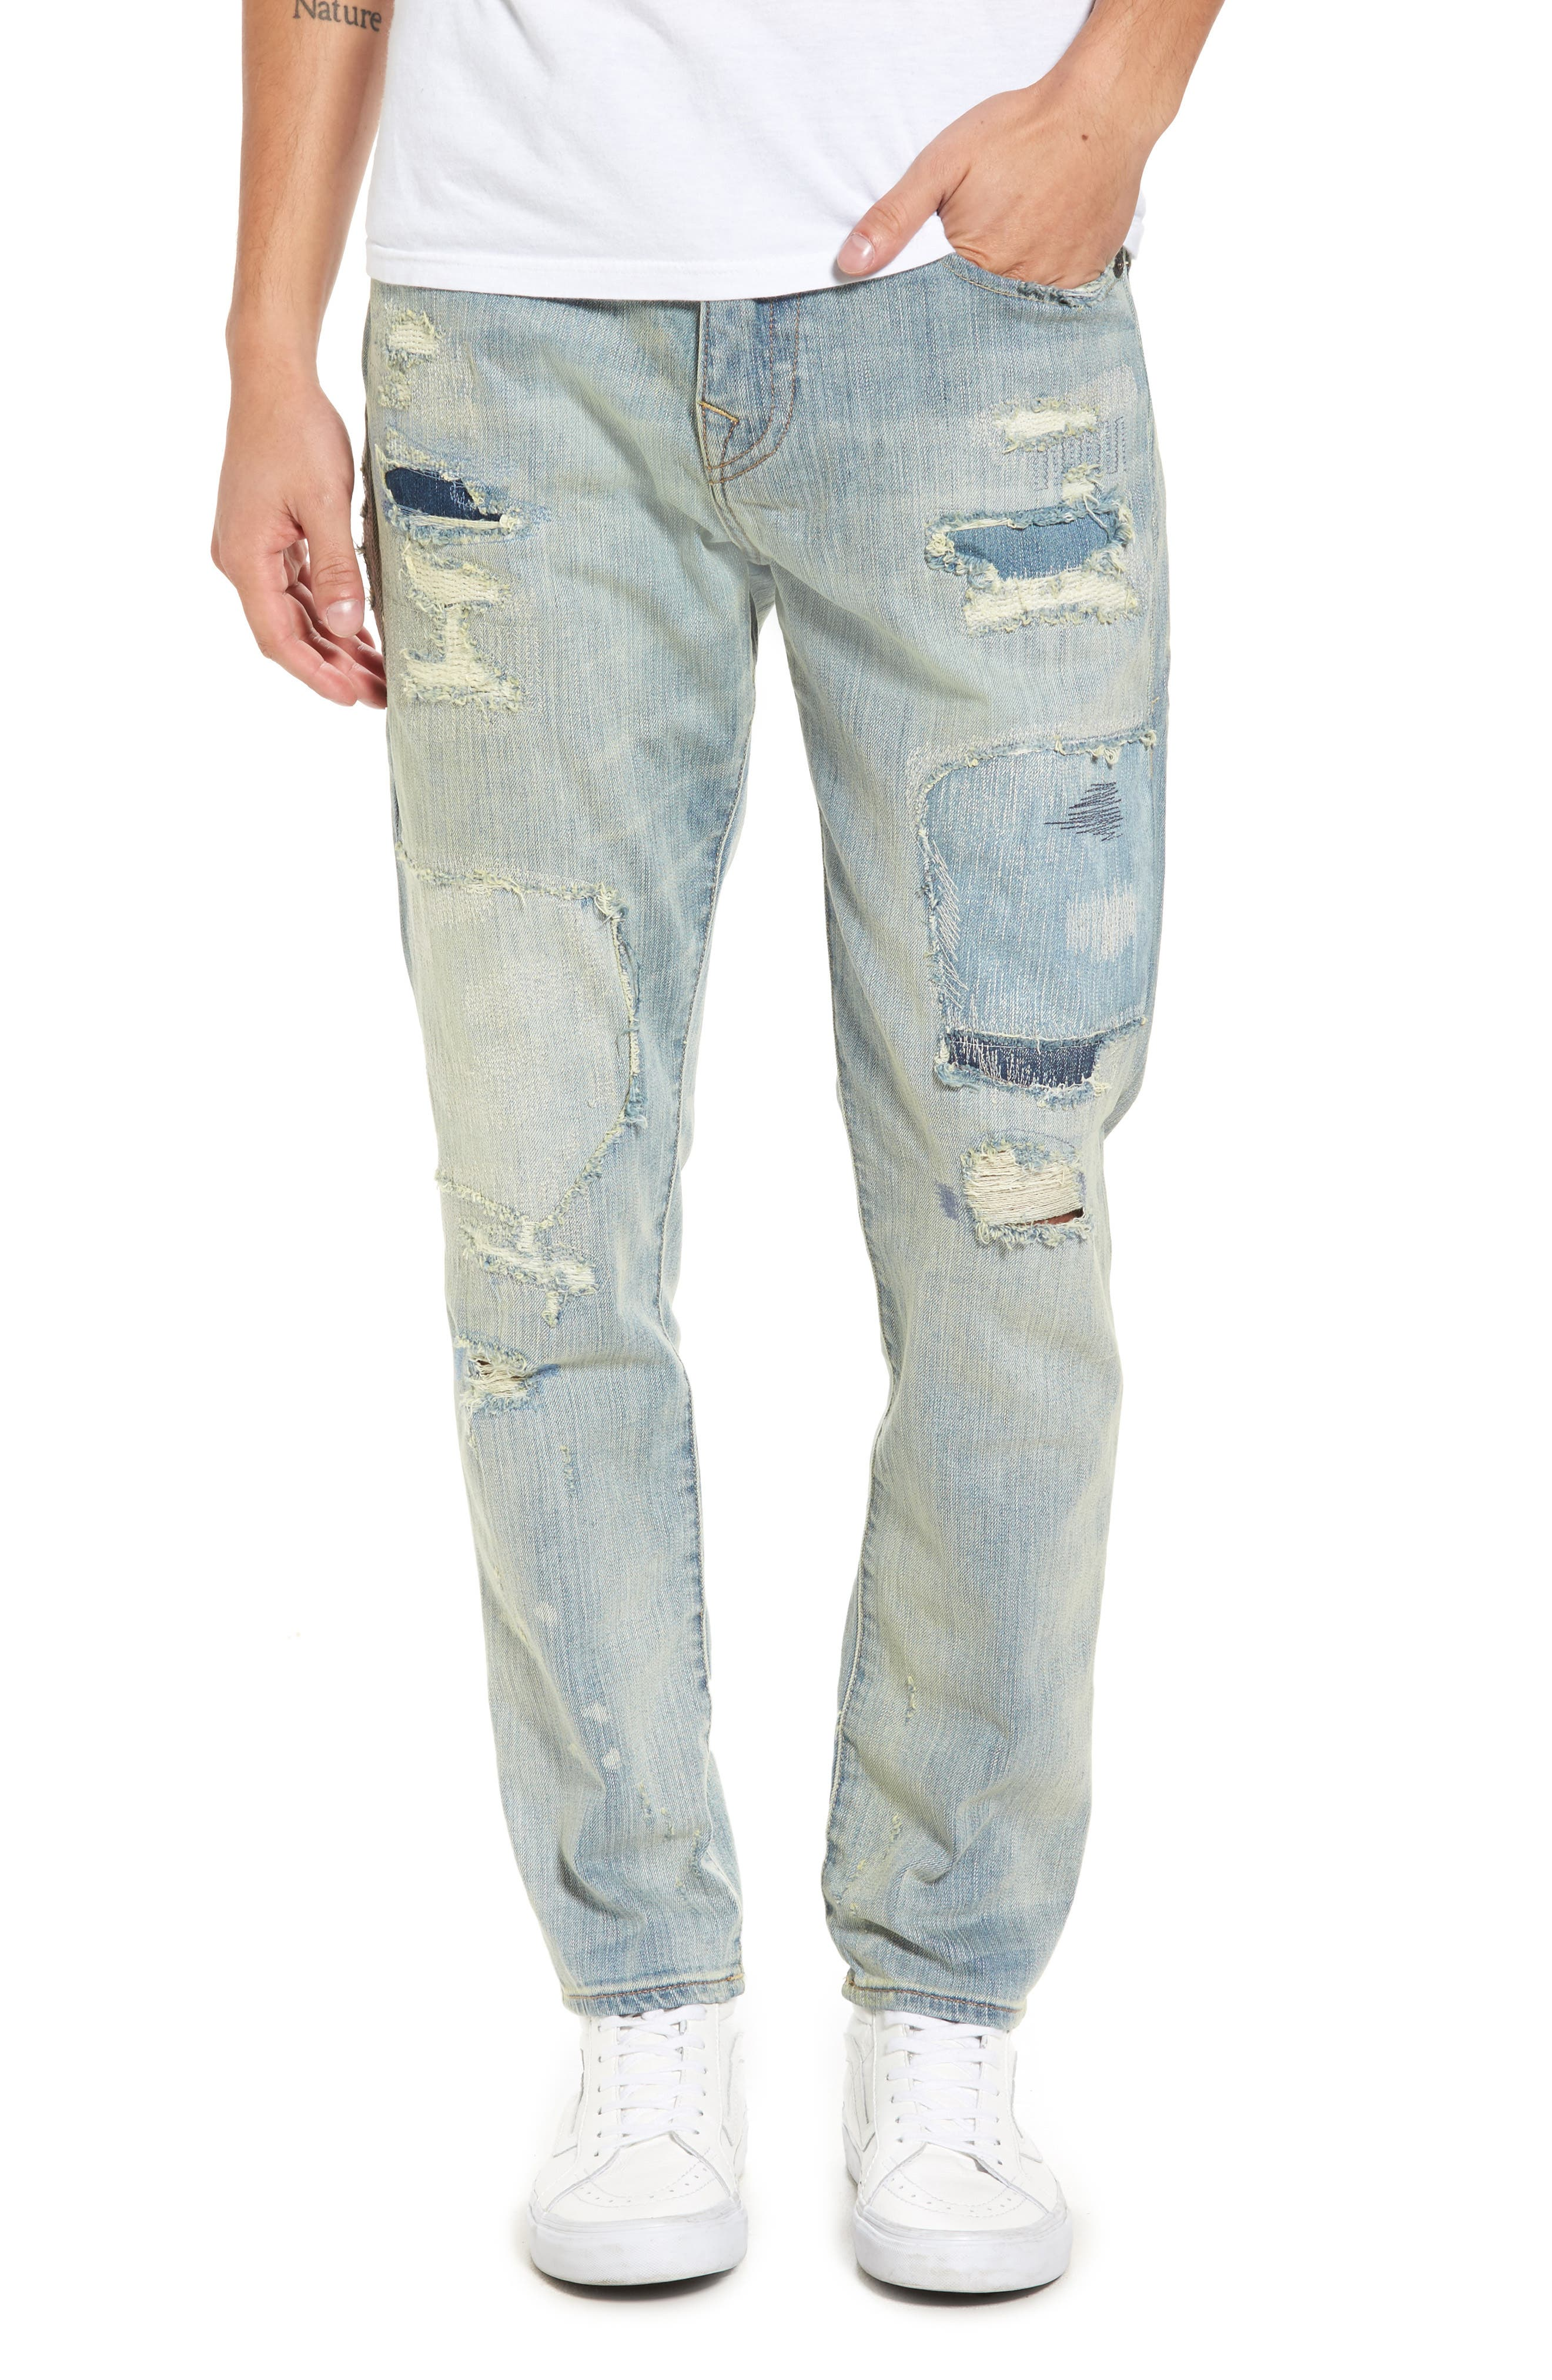 True Religion Brand Jeans Mick Skinny Fit Jeans (Indigo Immortal)